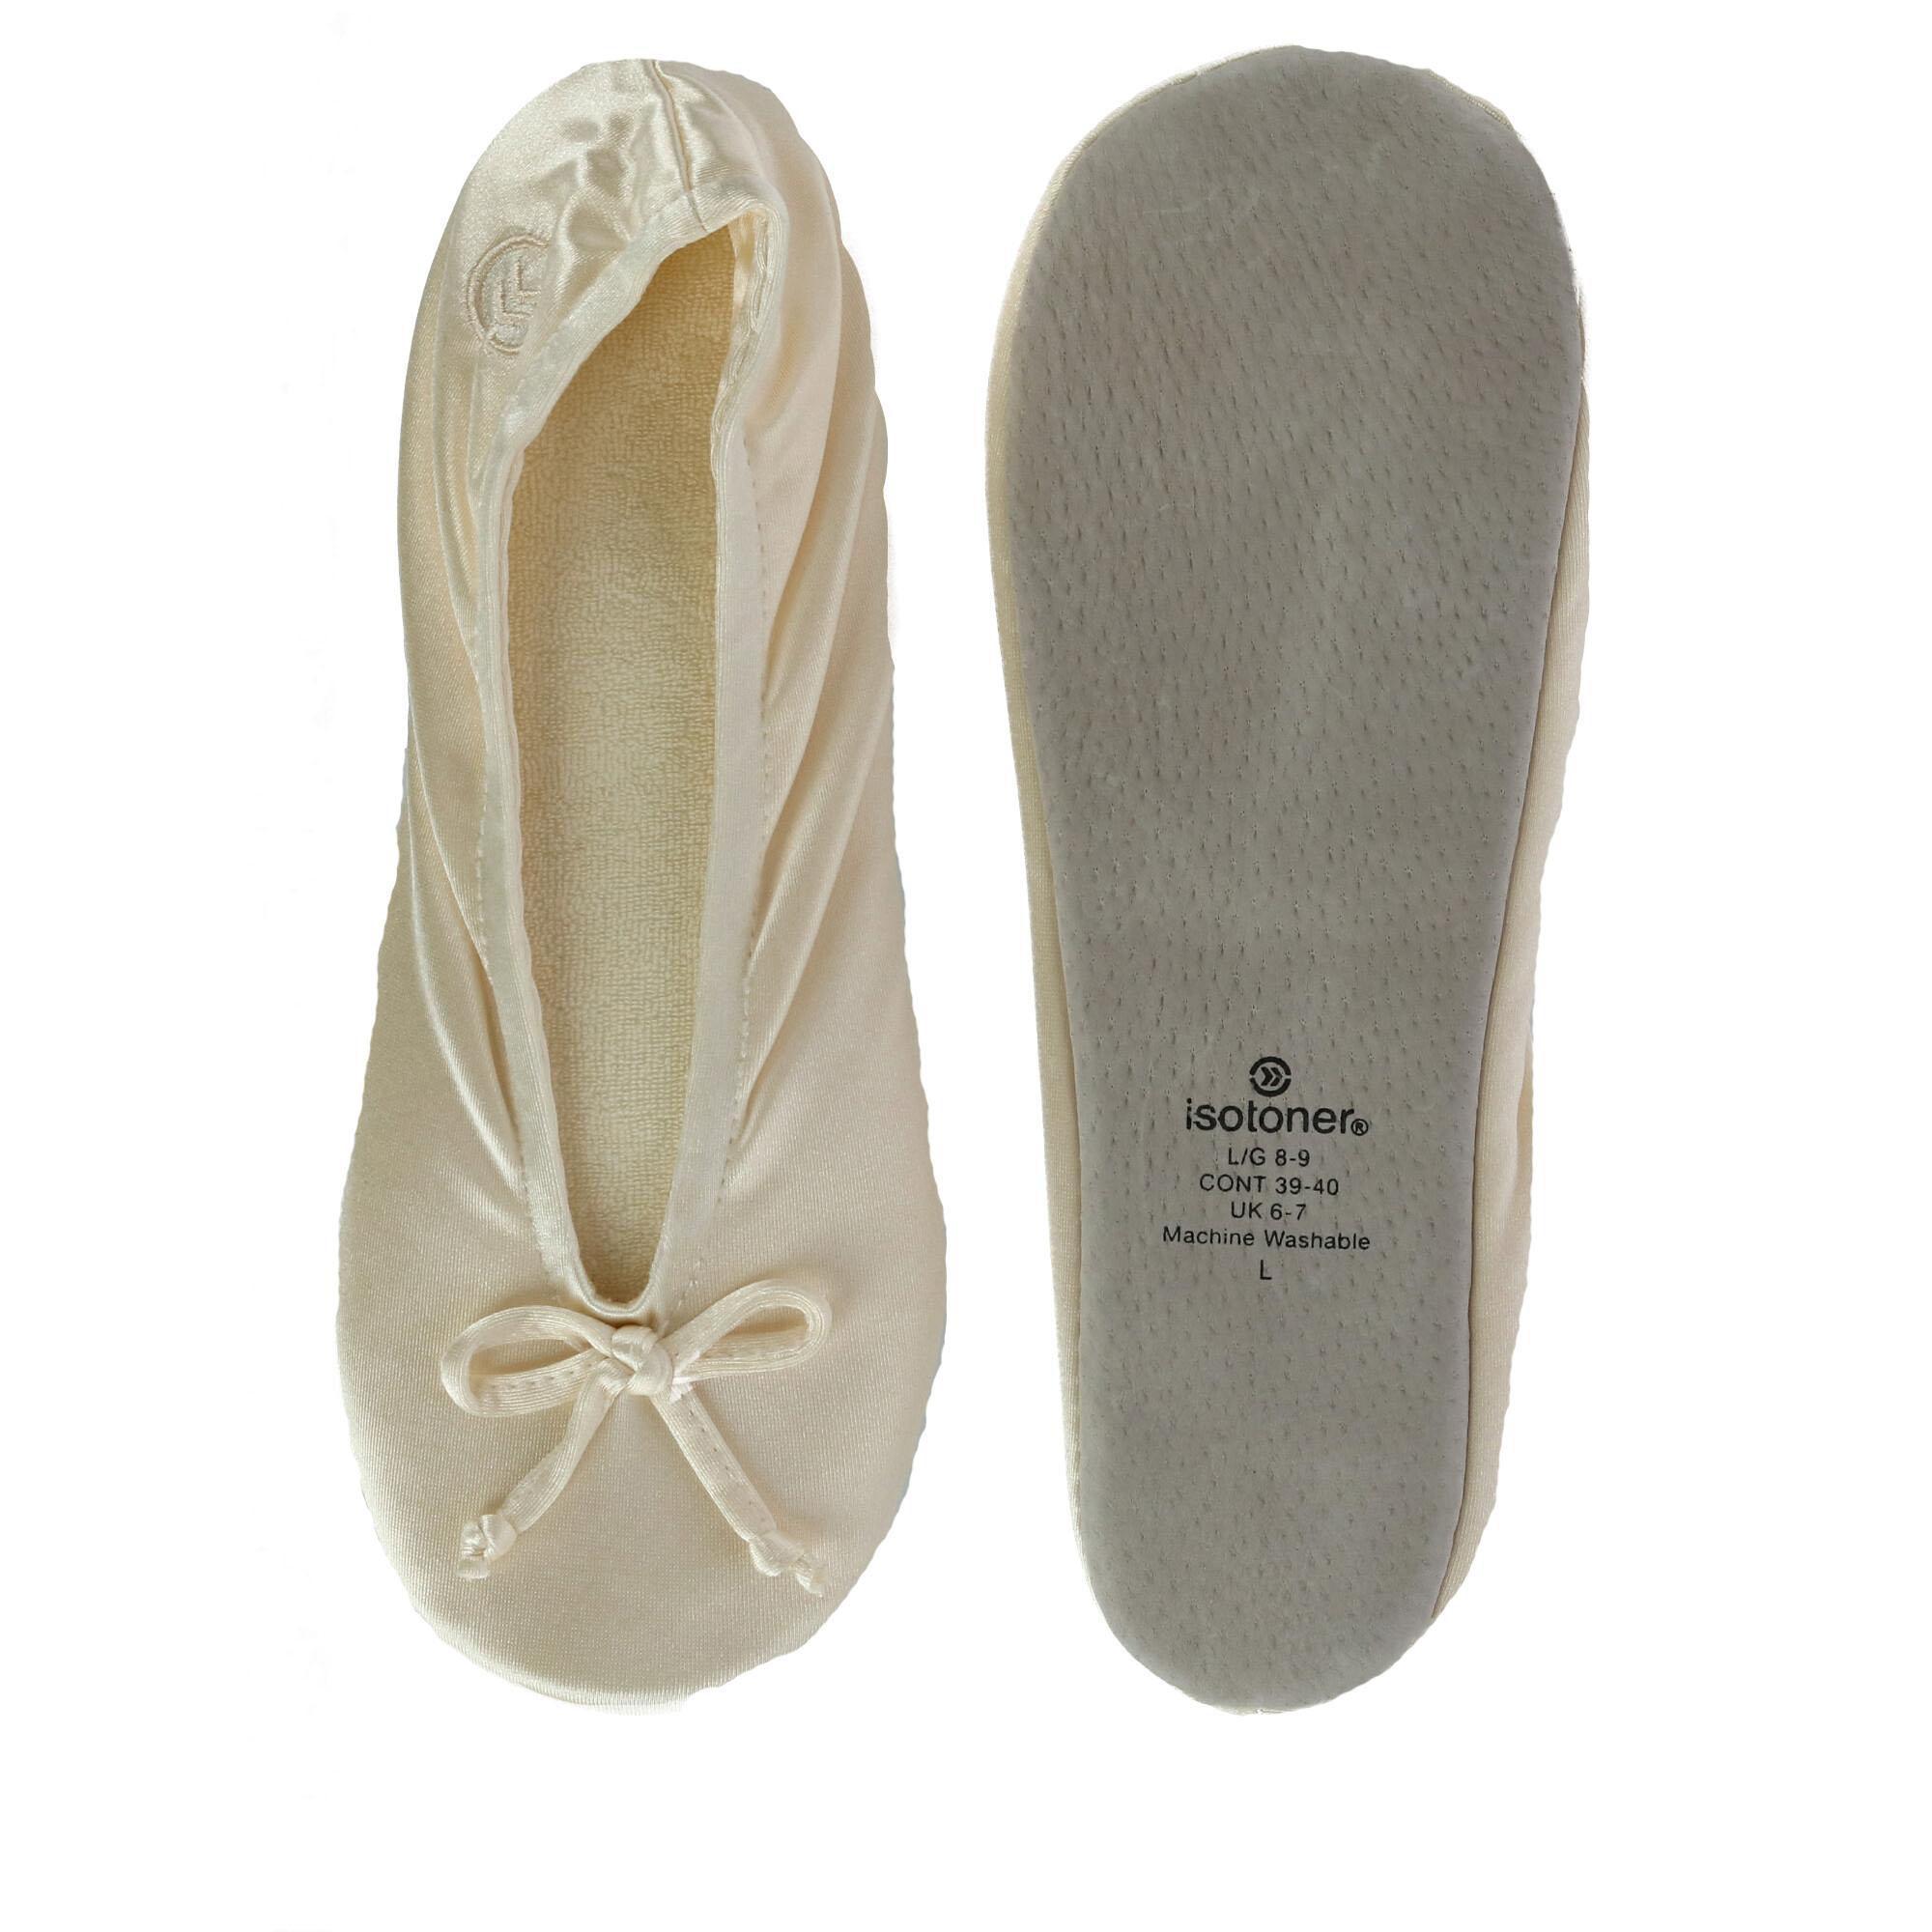 New-Isotoner-Women-039-s-Satin-Classic-Ballerina-Slippers thumbnail 13